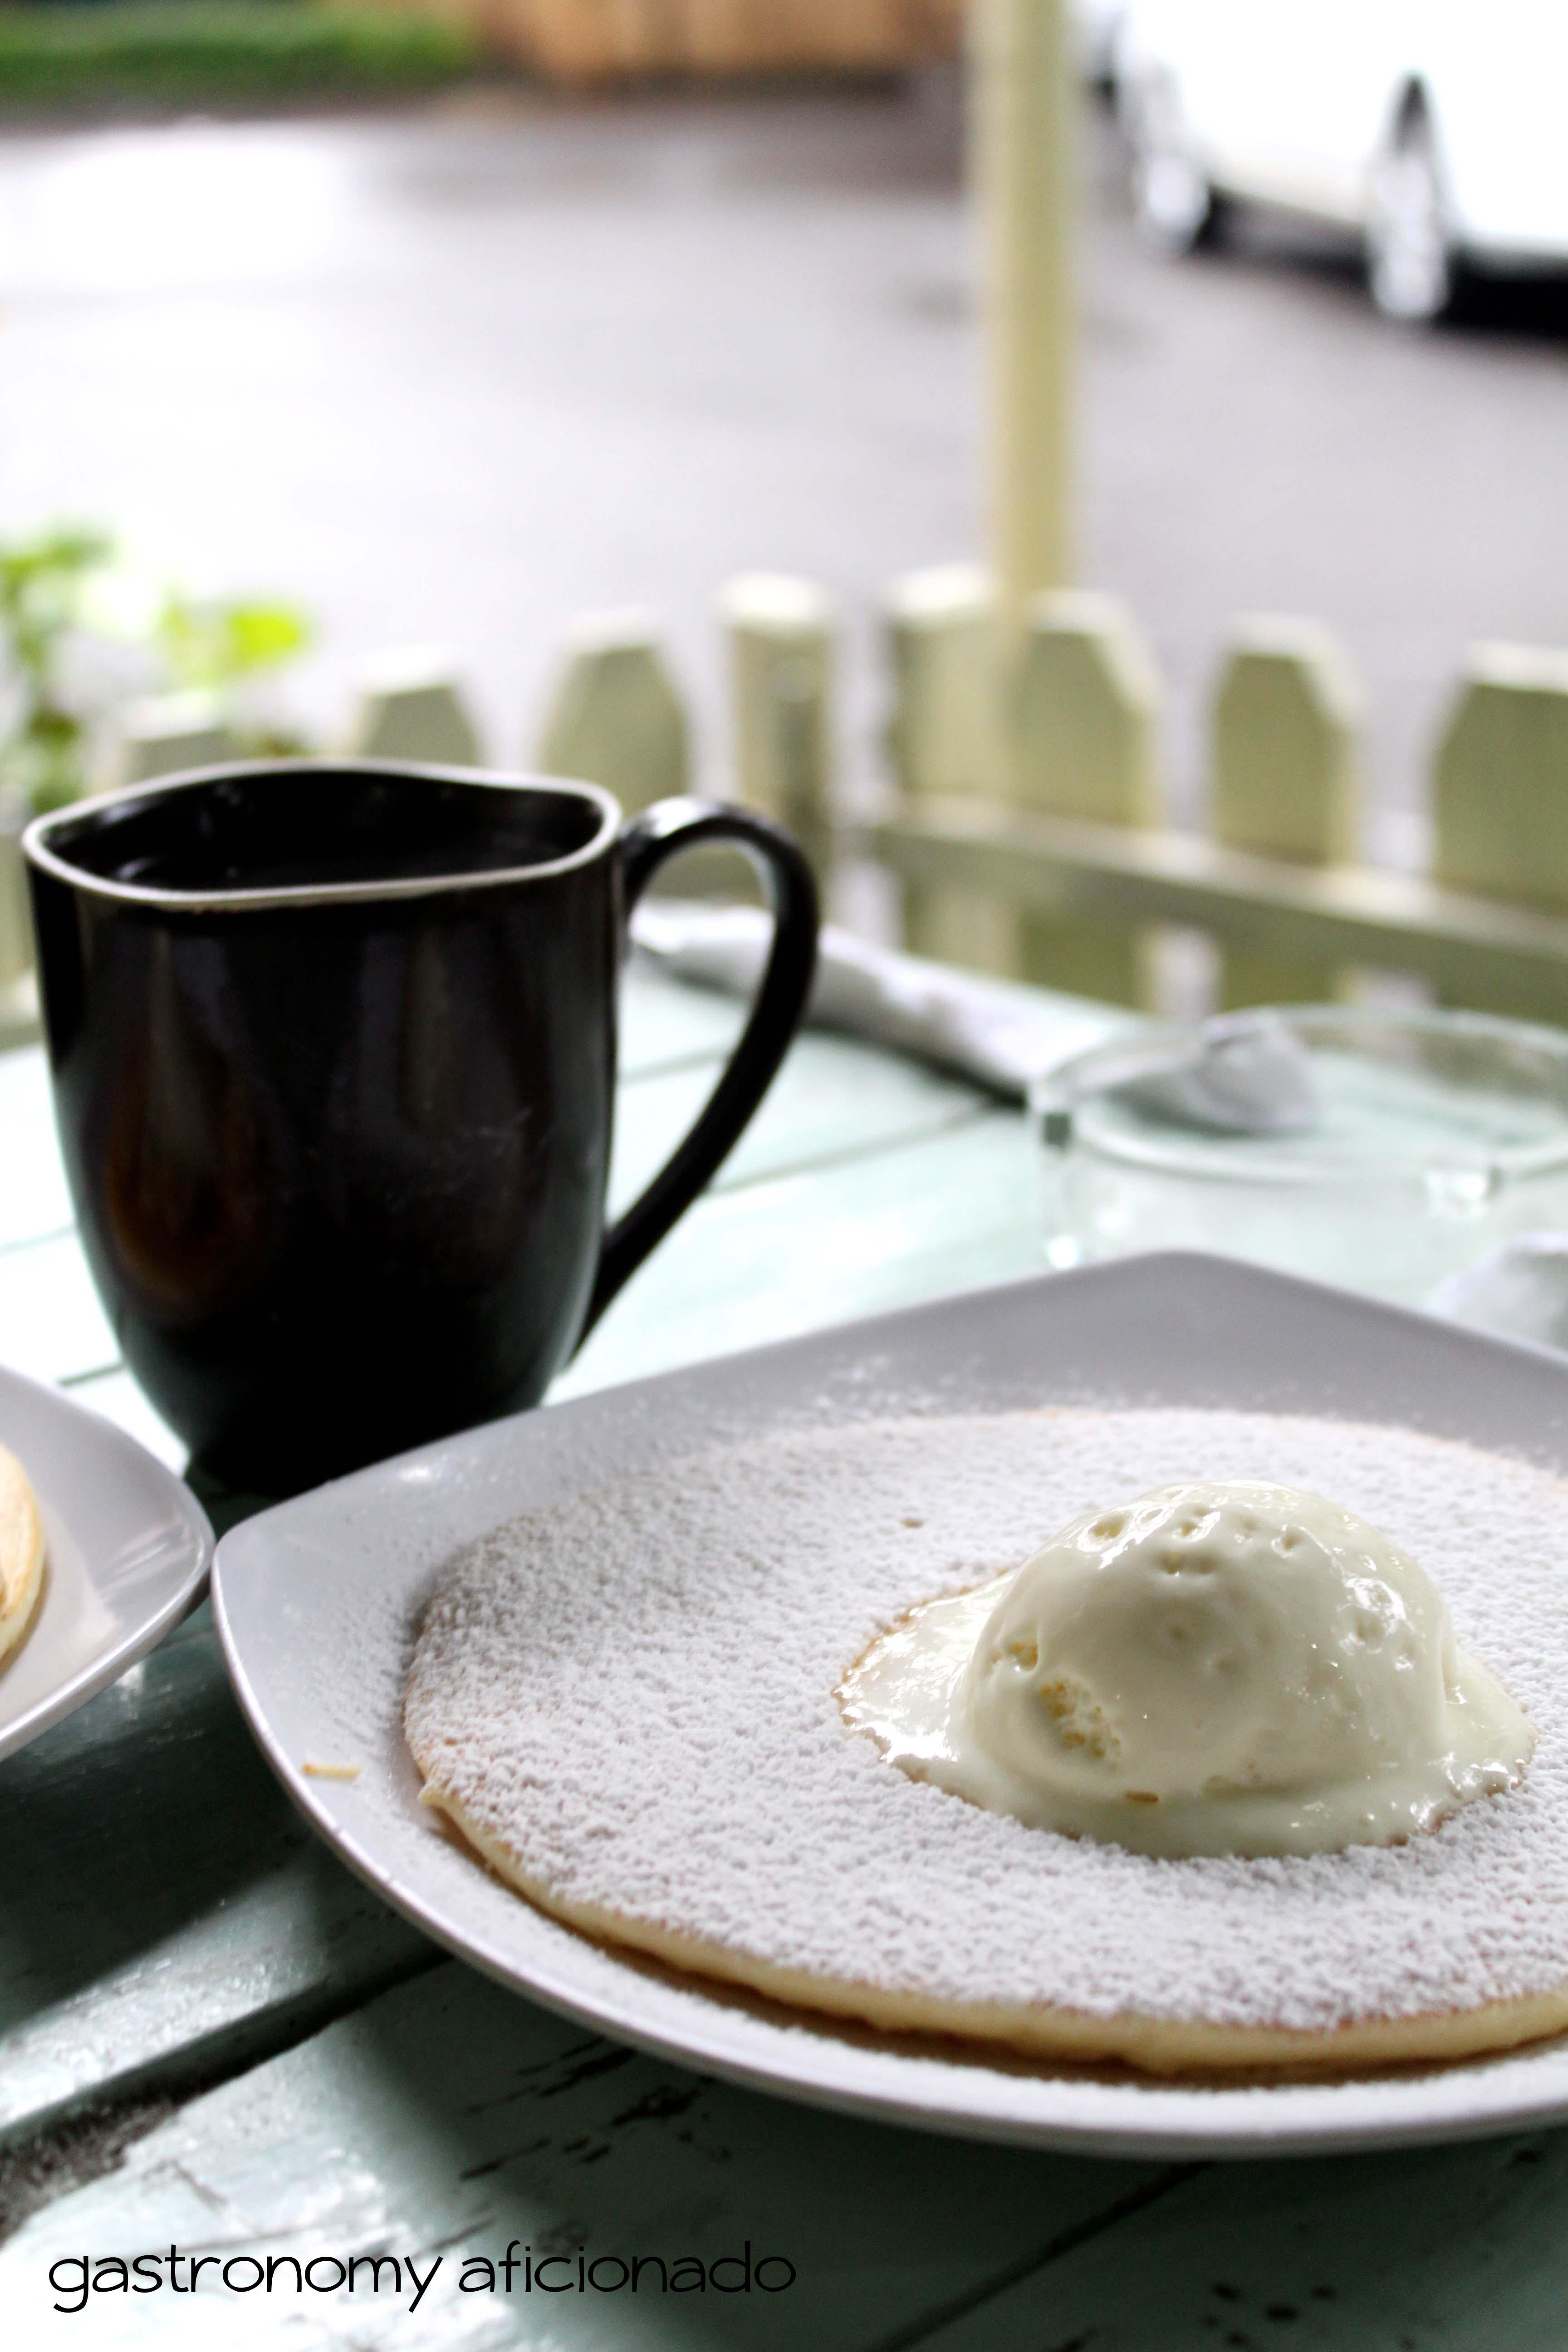 Yuky Penkeik - Sugar & Vanilla Ice Cream Pancake